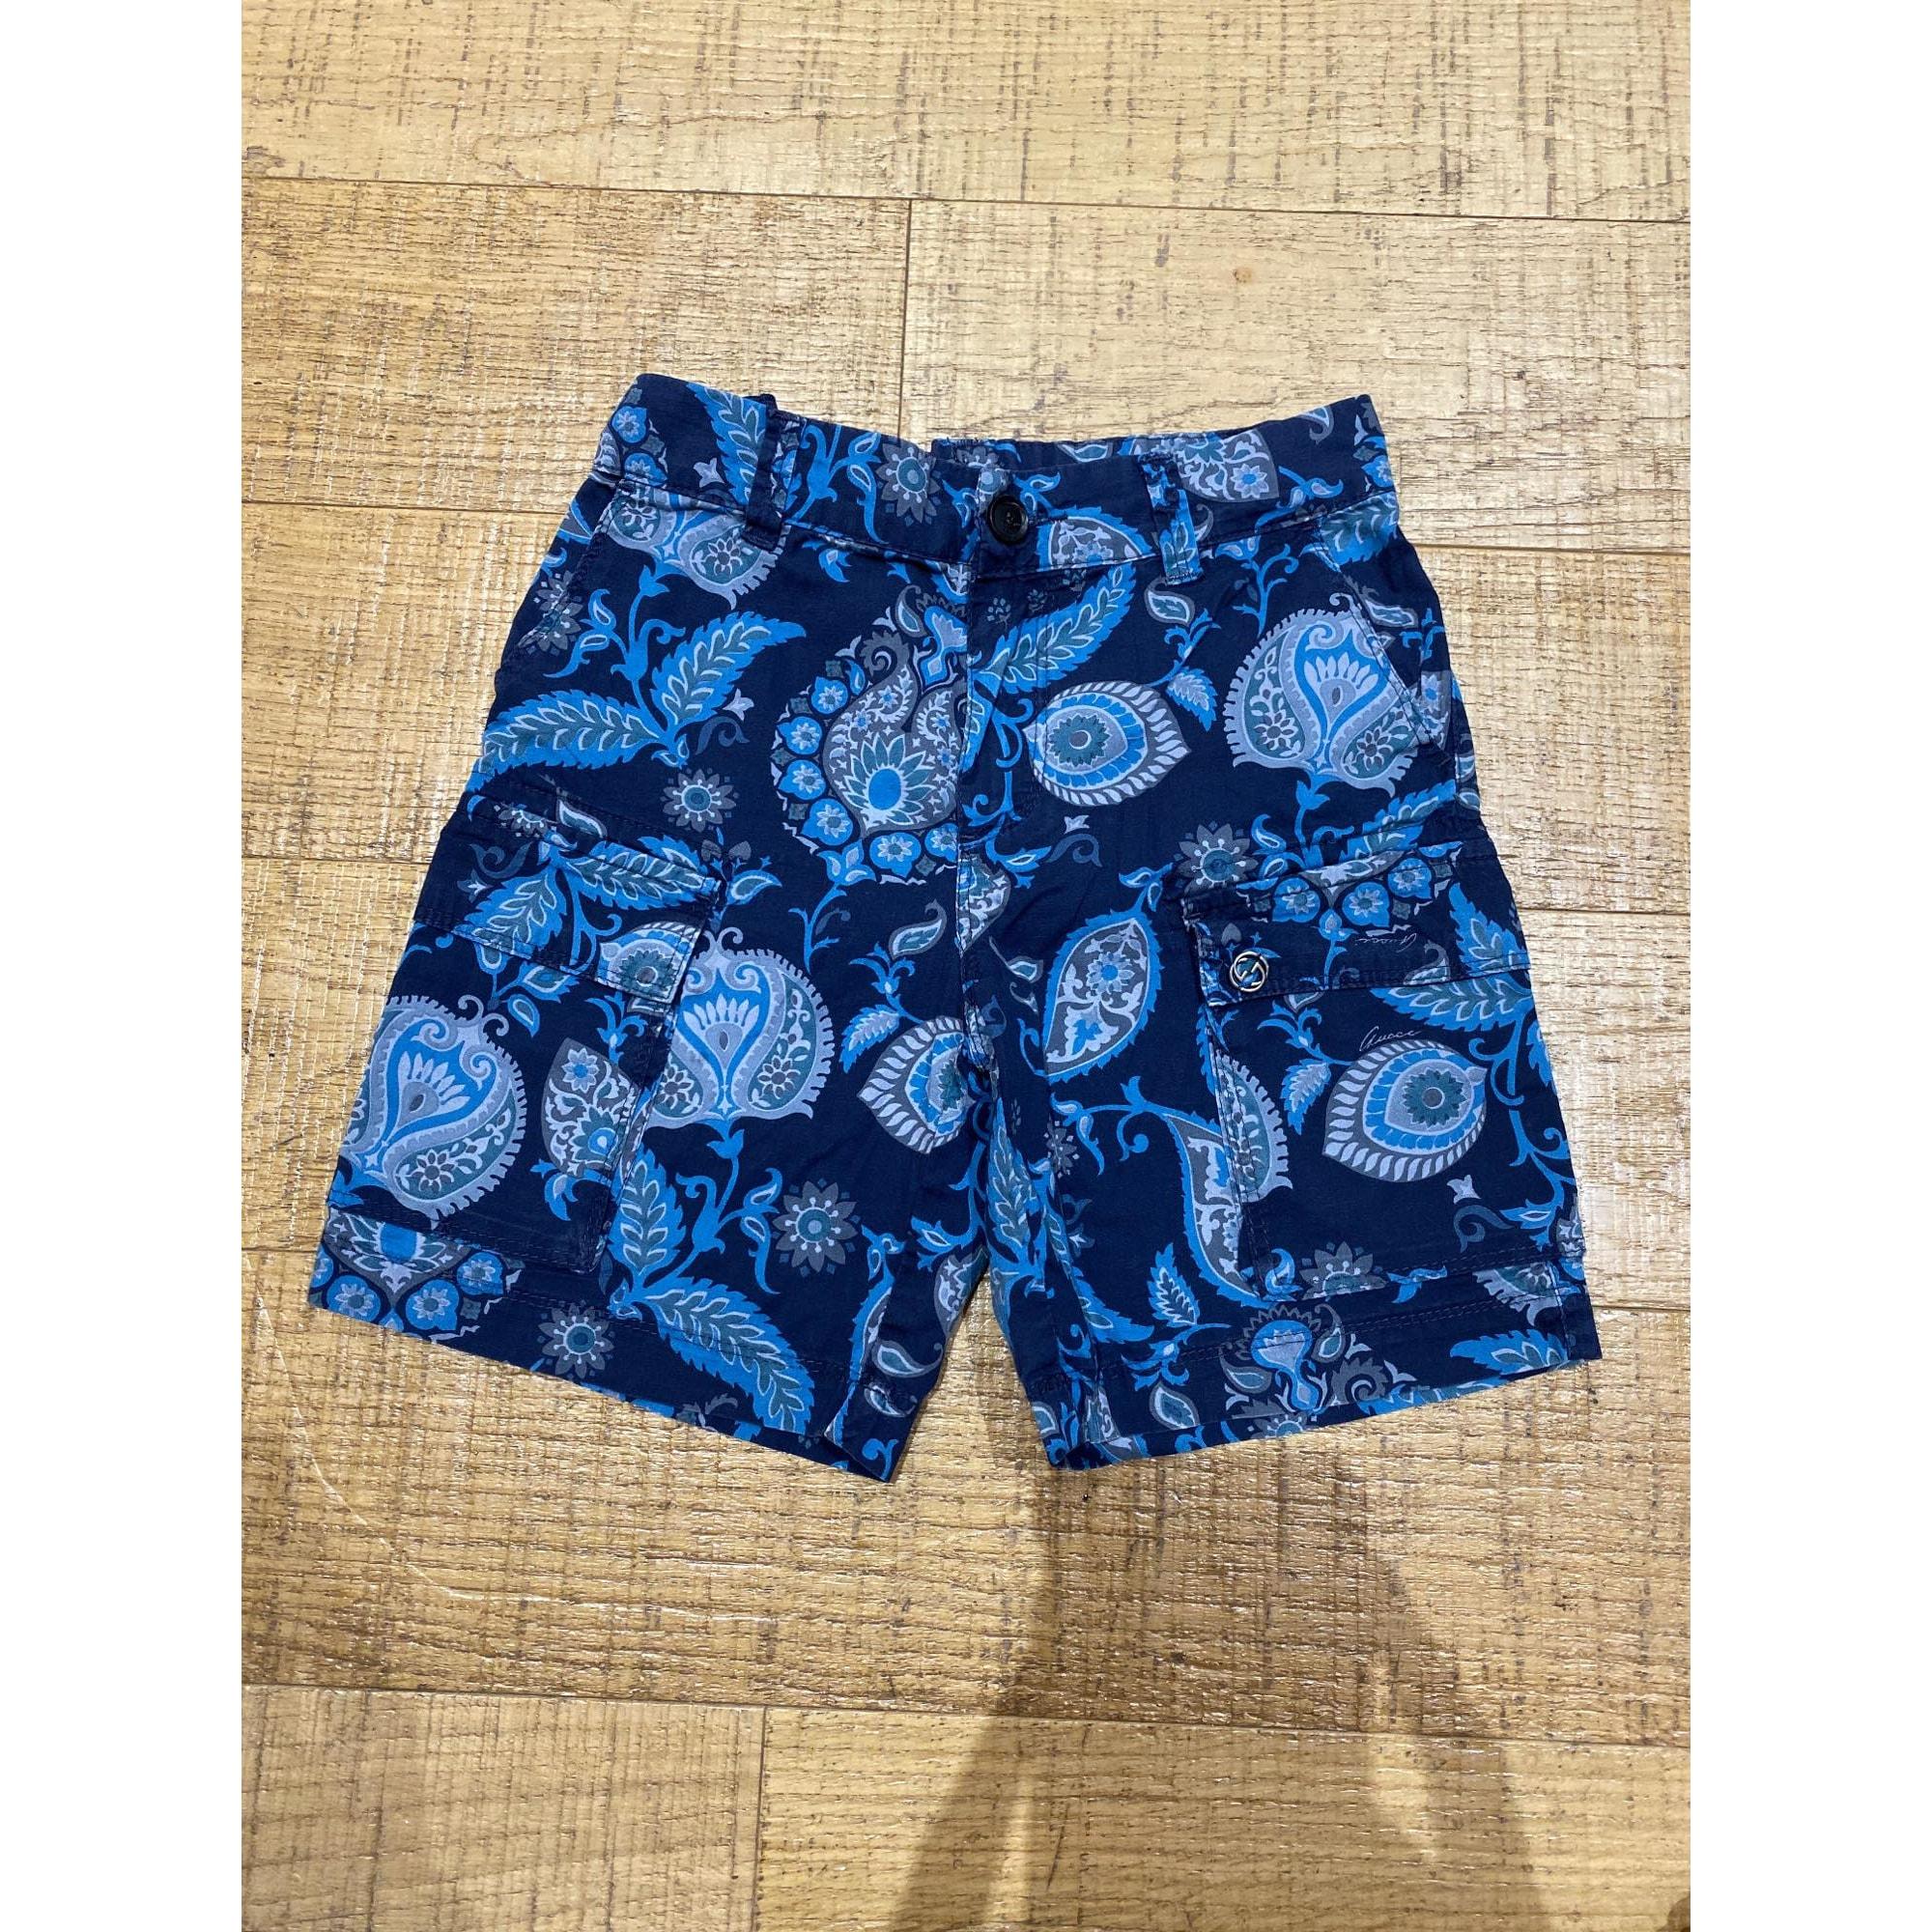 Short GUCCI Bleu, bleu marine, bleu turquoise